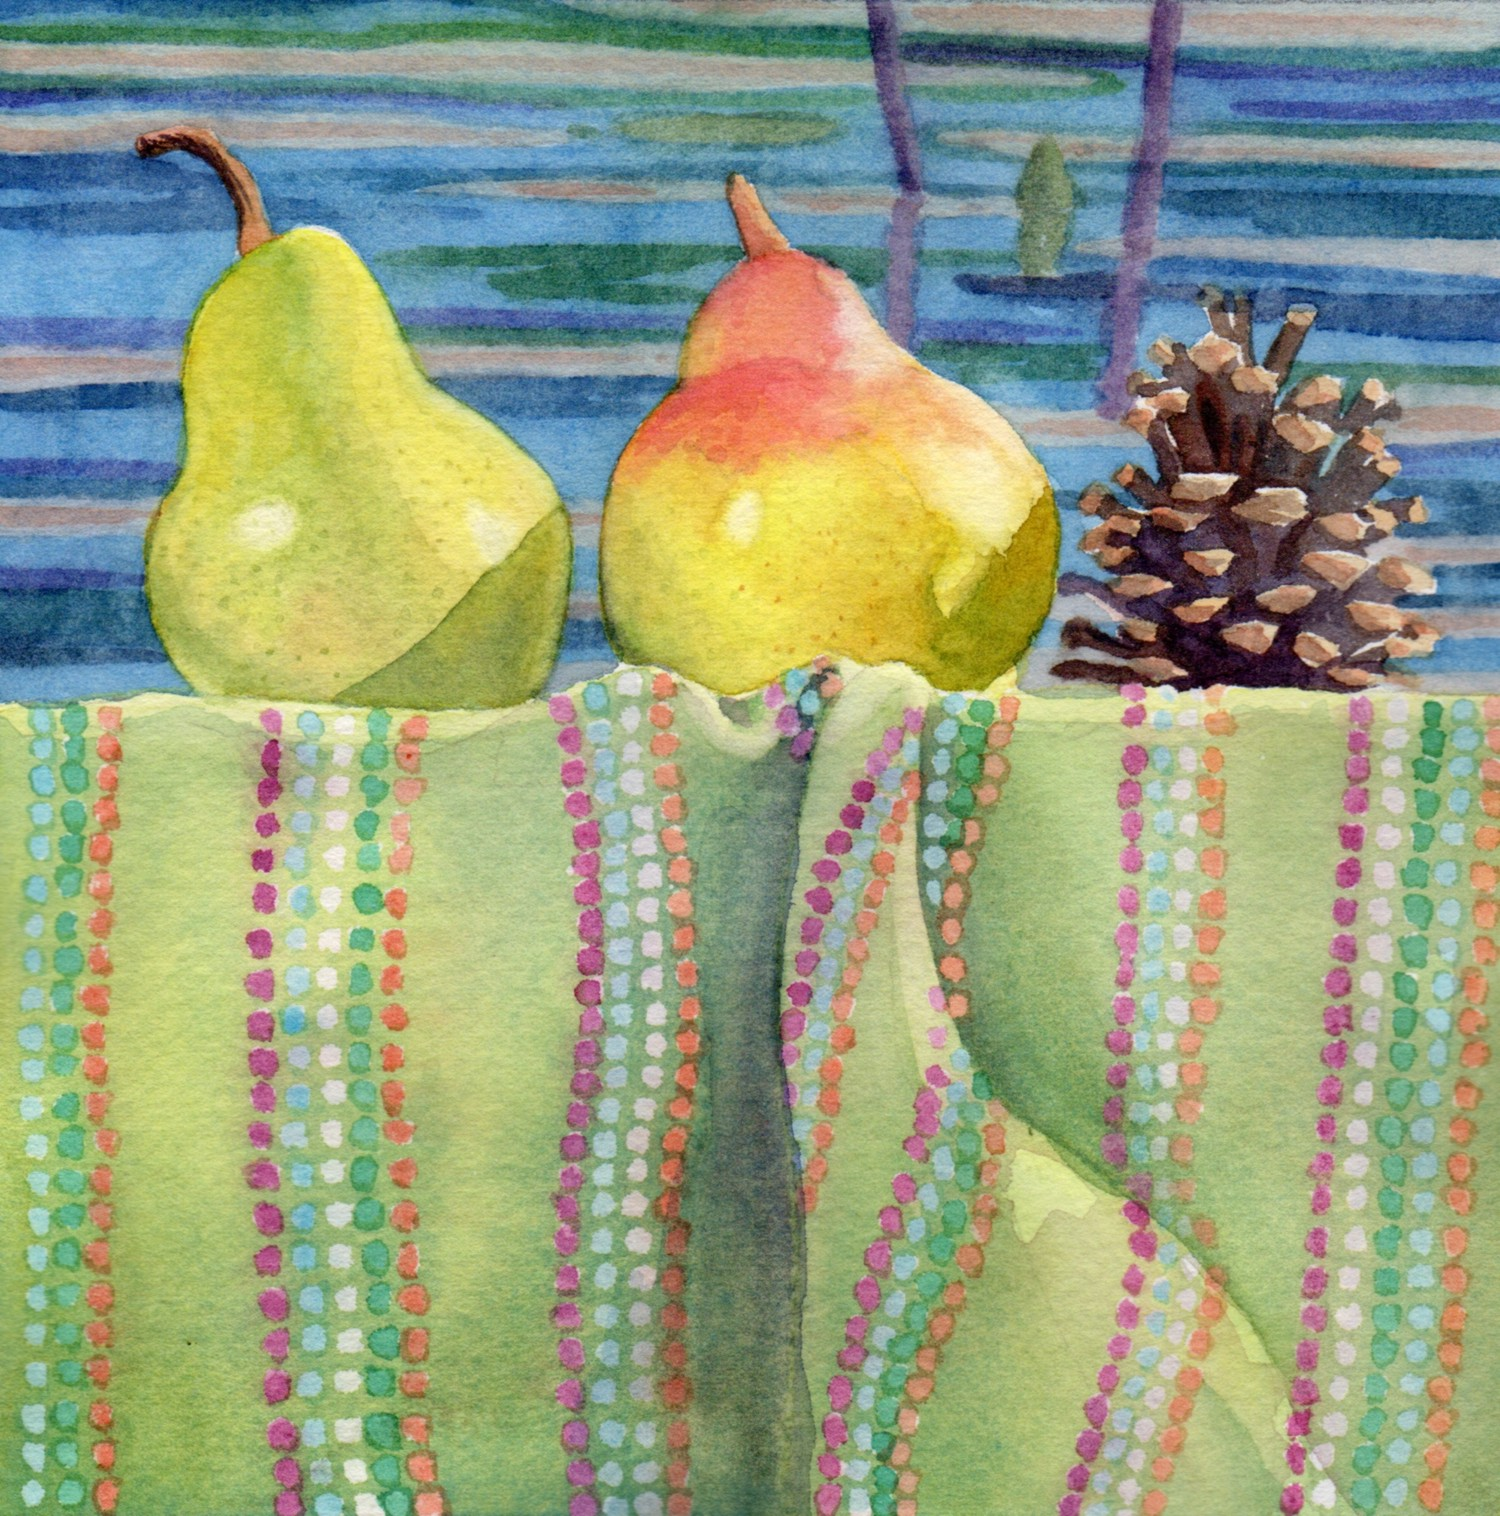 Pears, Pine Cone, Polka-Dots, Painting © Lorraine Watry